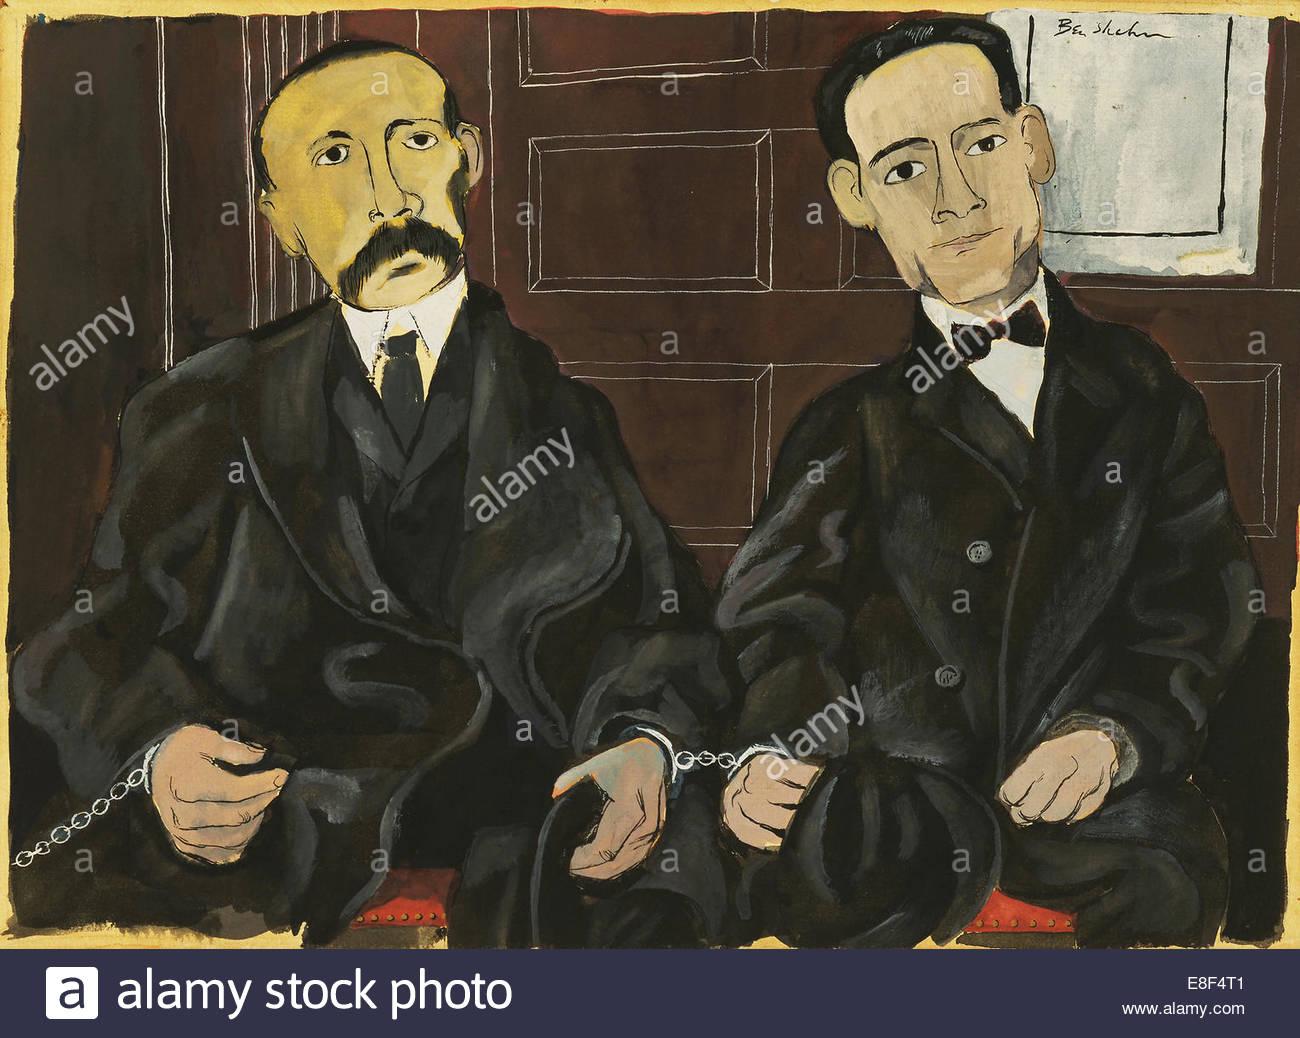 Bartolomeo Vanzetti and Nicola Sacco. Artist: Shahn, Ben (1898-1969) - Stock Image